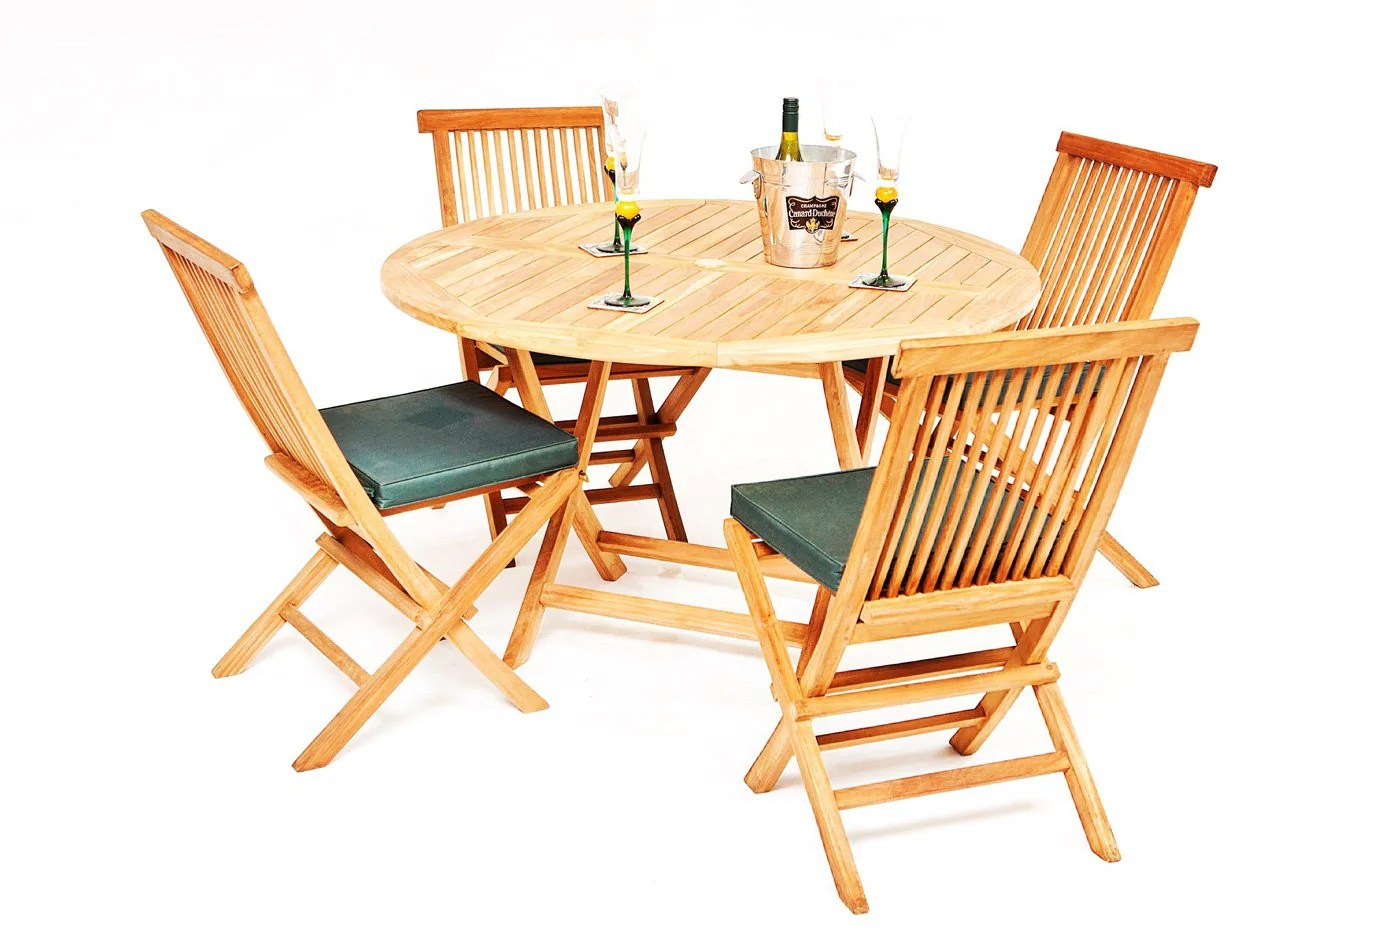 The Pocklington 4 Seater Teak Garden Table Chairs Set